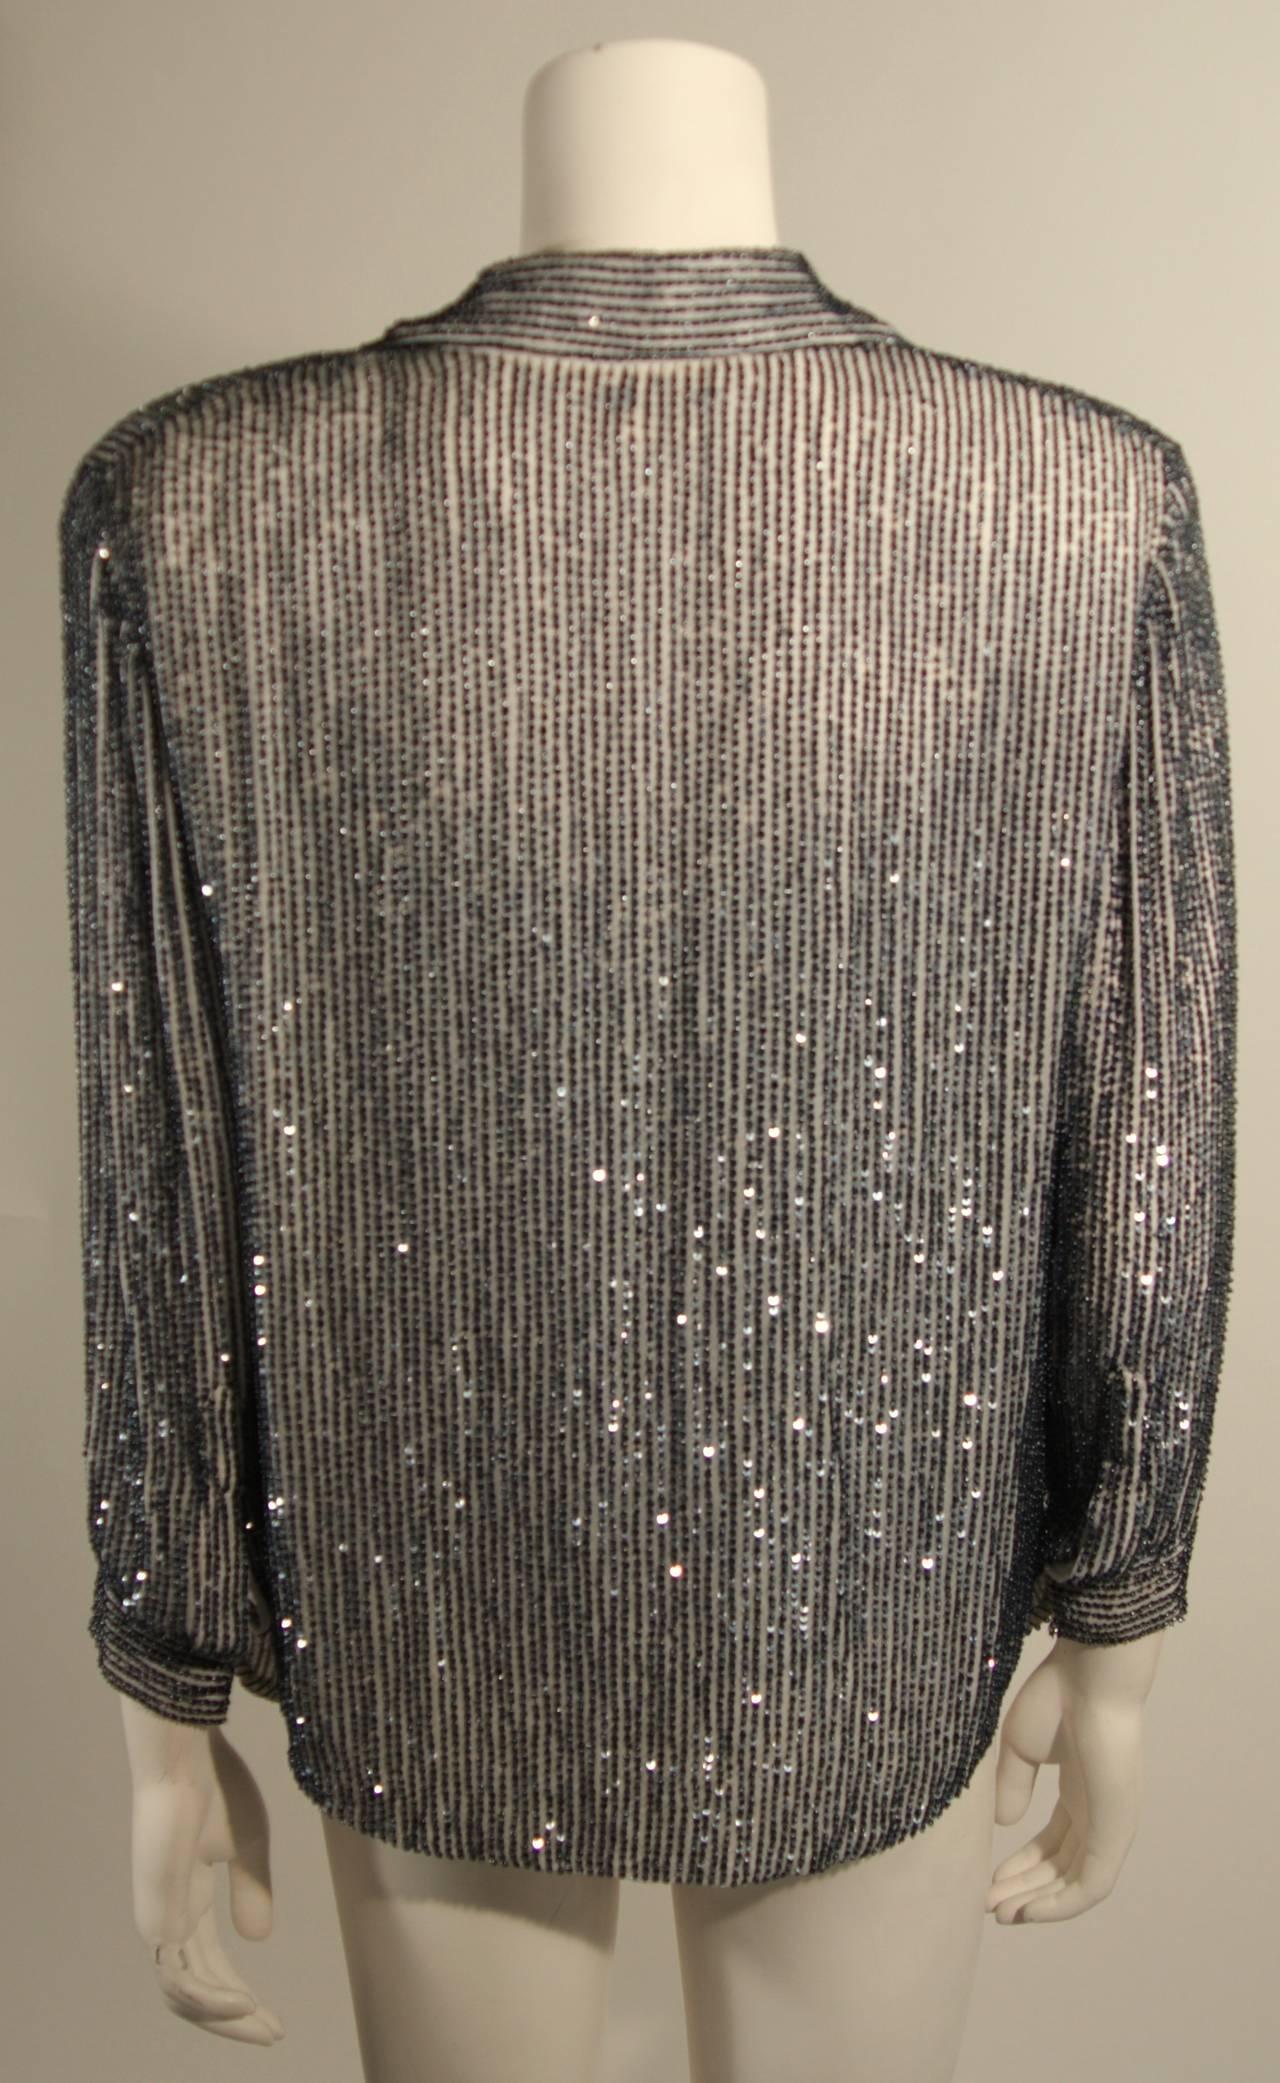 Oscar De La Renta Evening Blouse and Camisole Size 8 For Sale 2